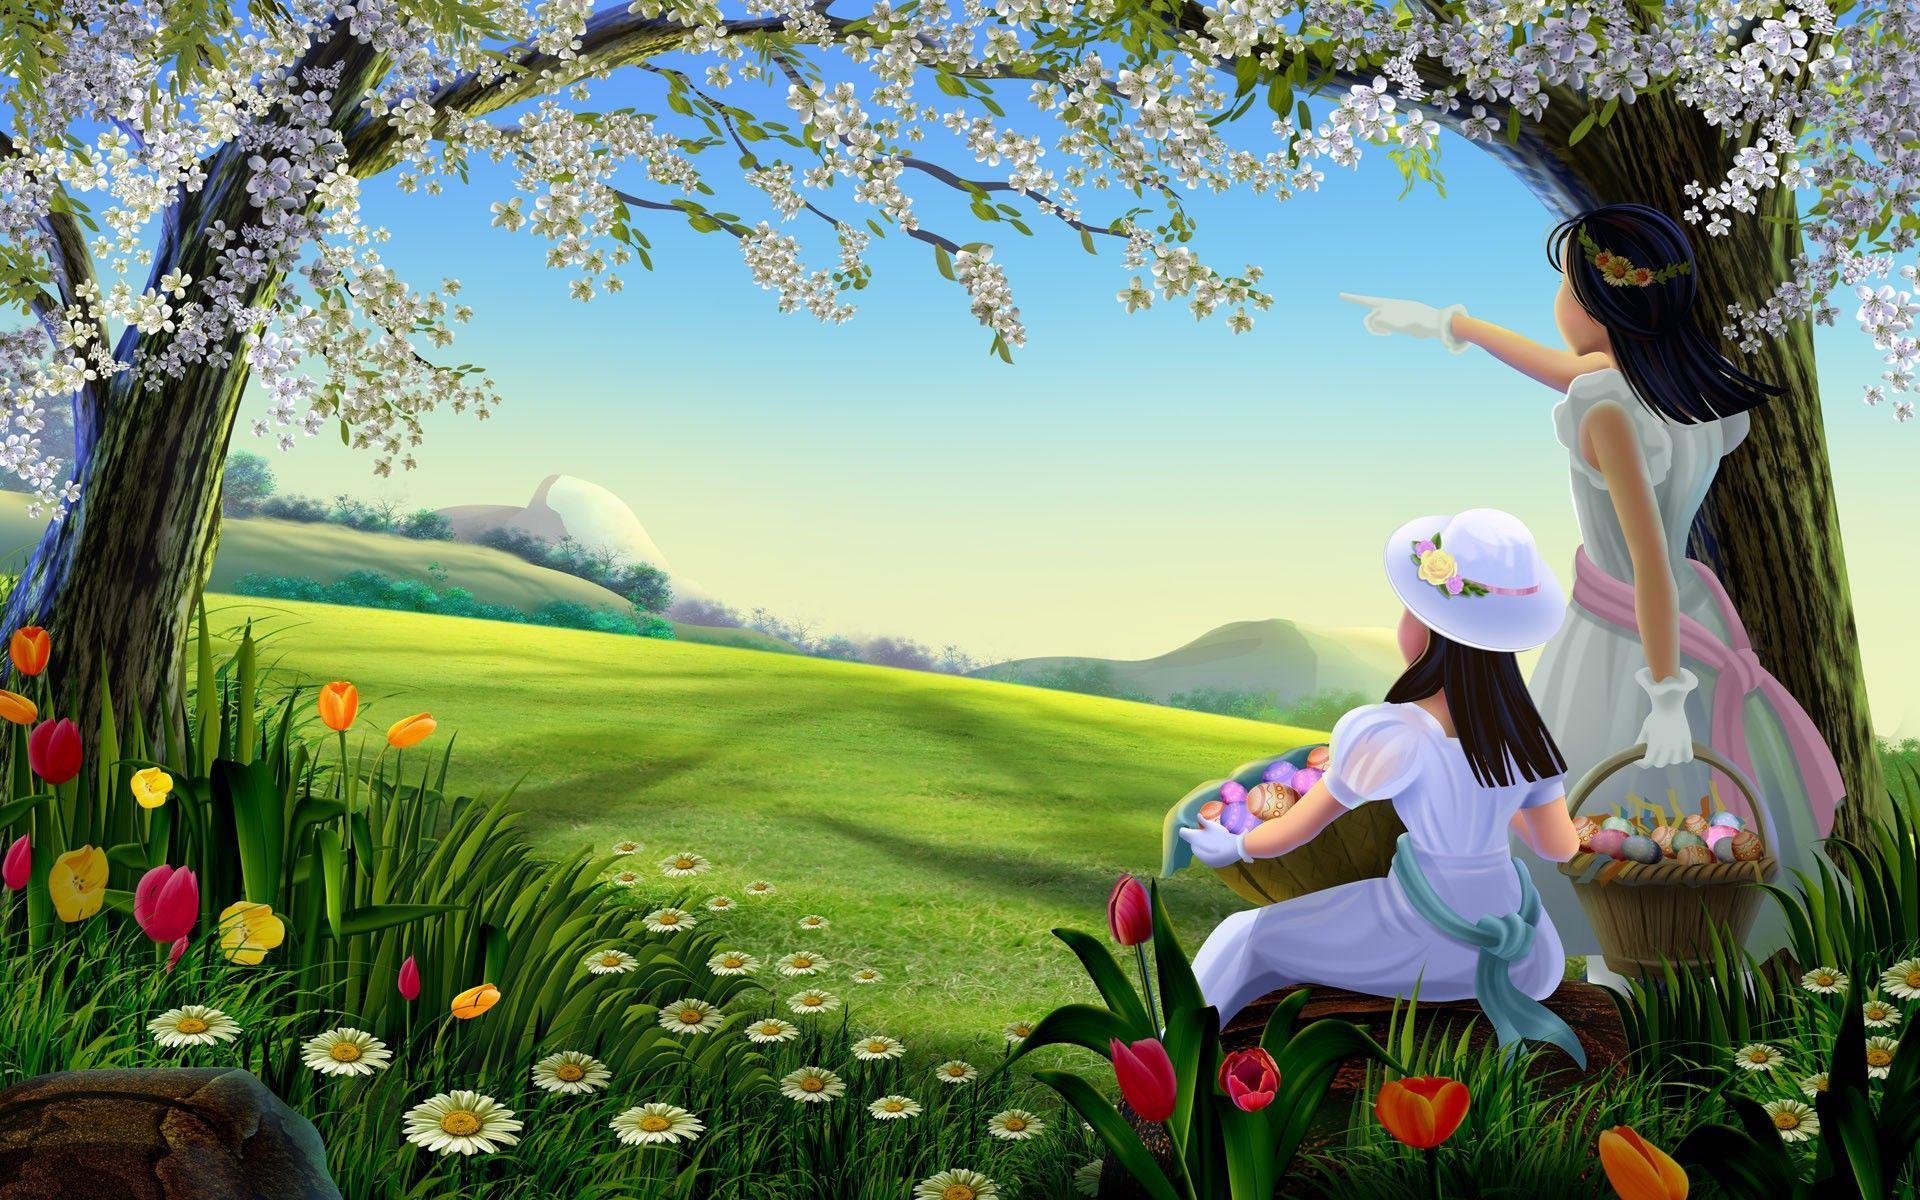 Nature Background Google Search Beautiful Nature Wallpaper Hd Nature Wallpapers Spring Wallpaper